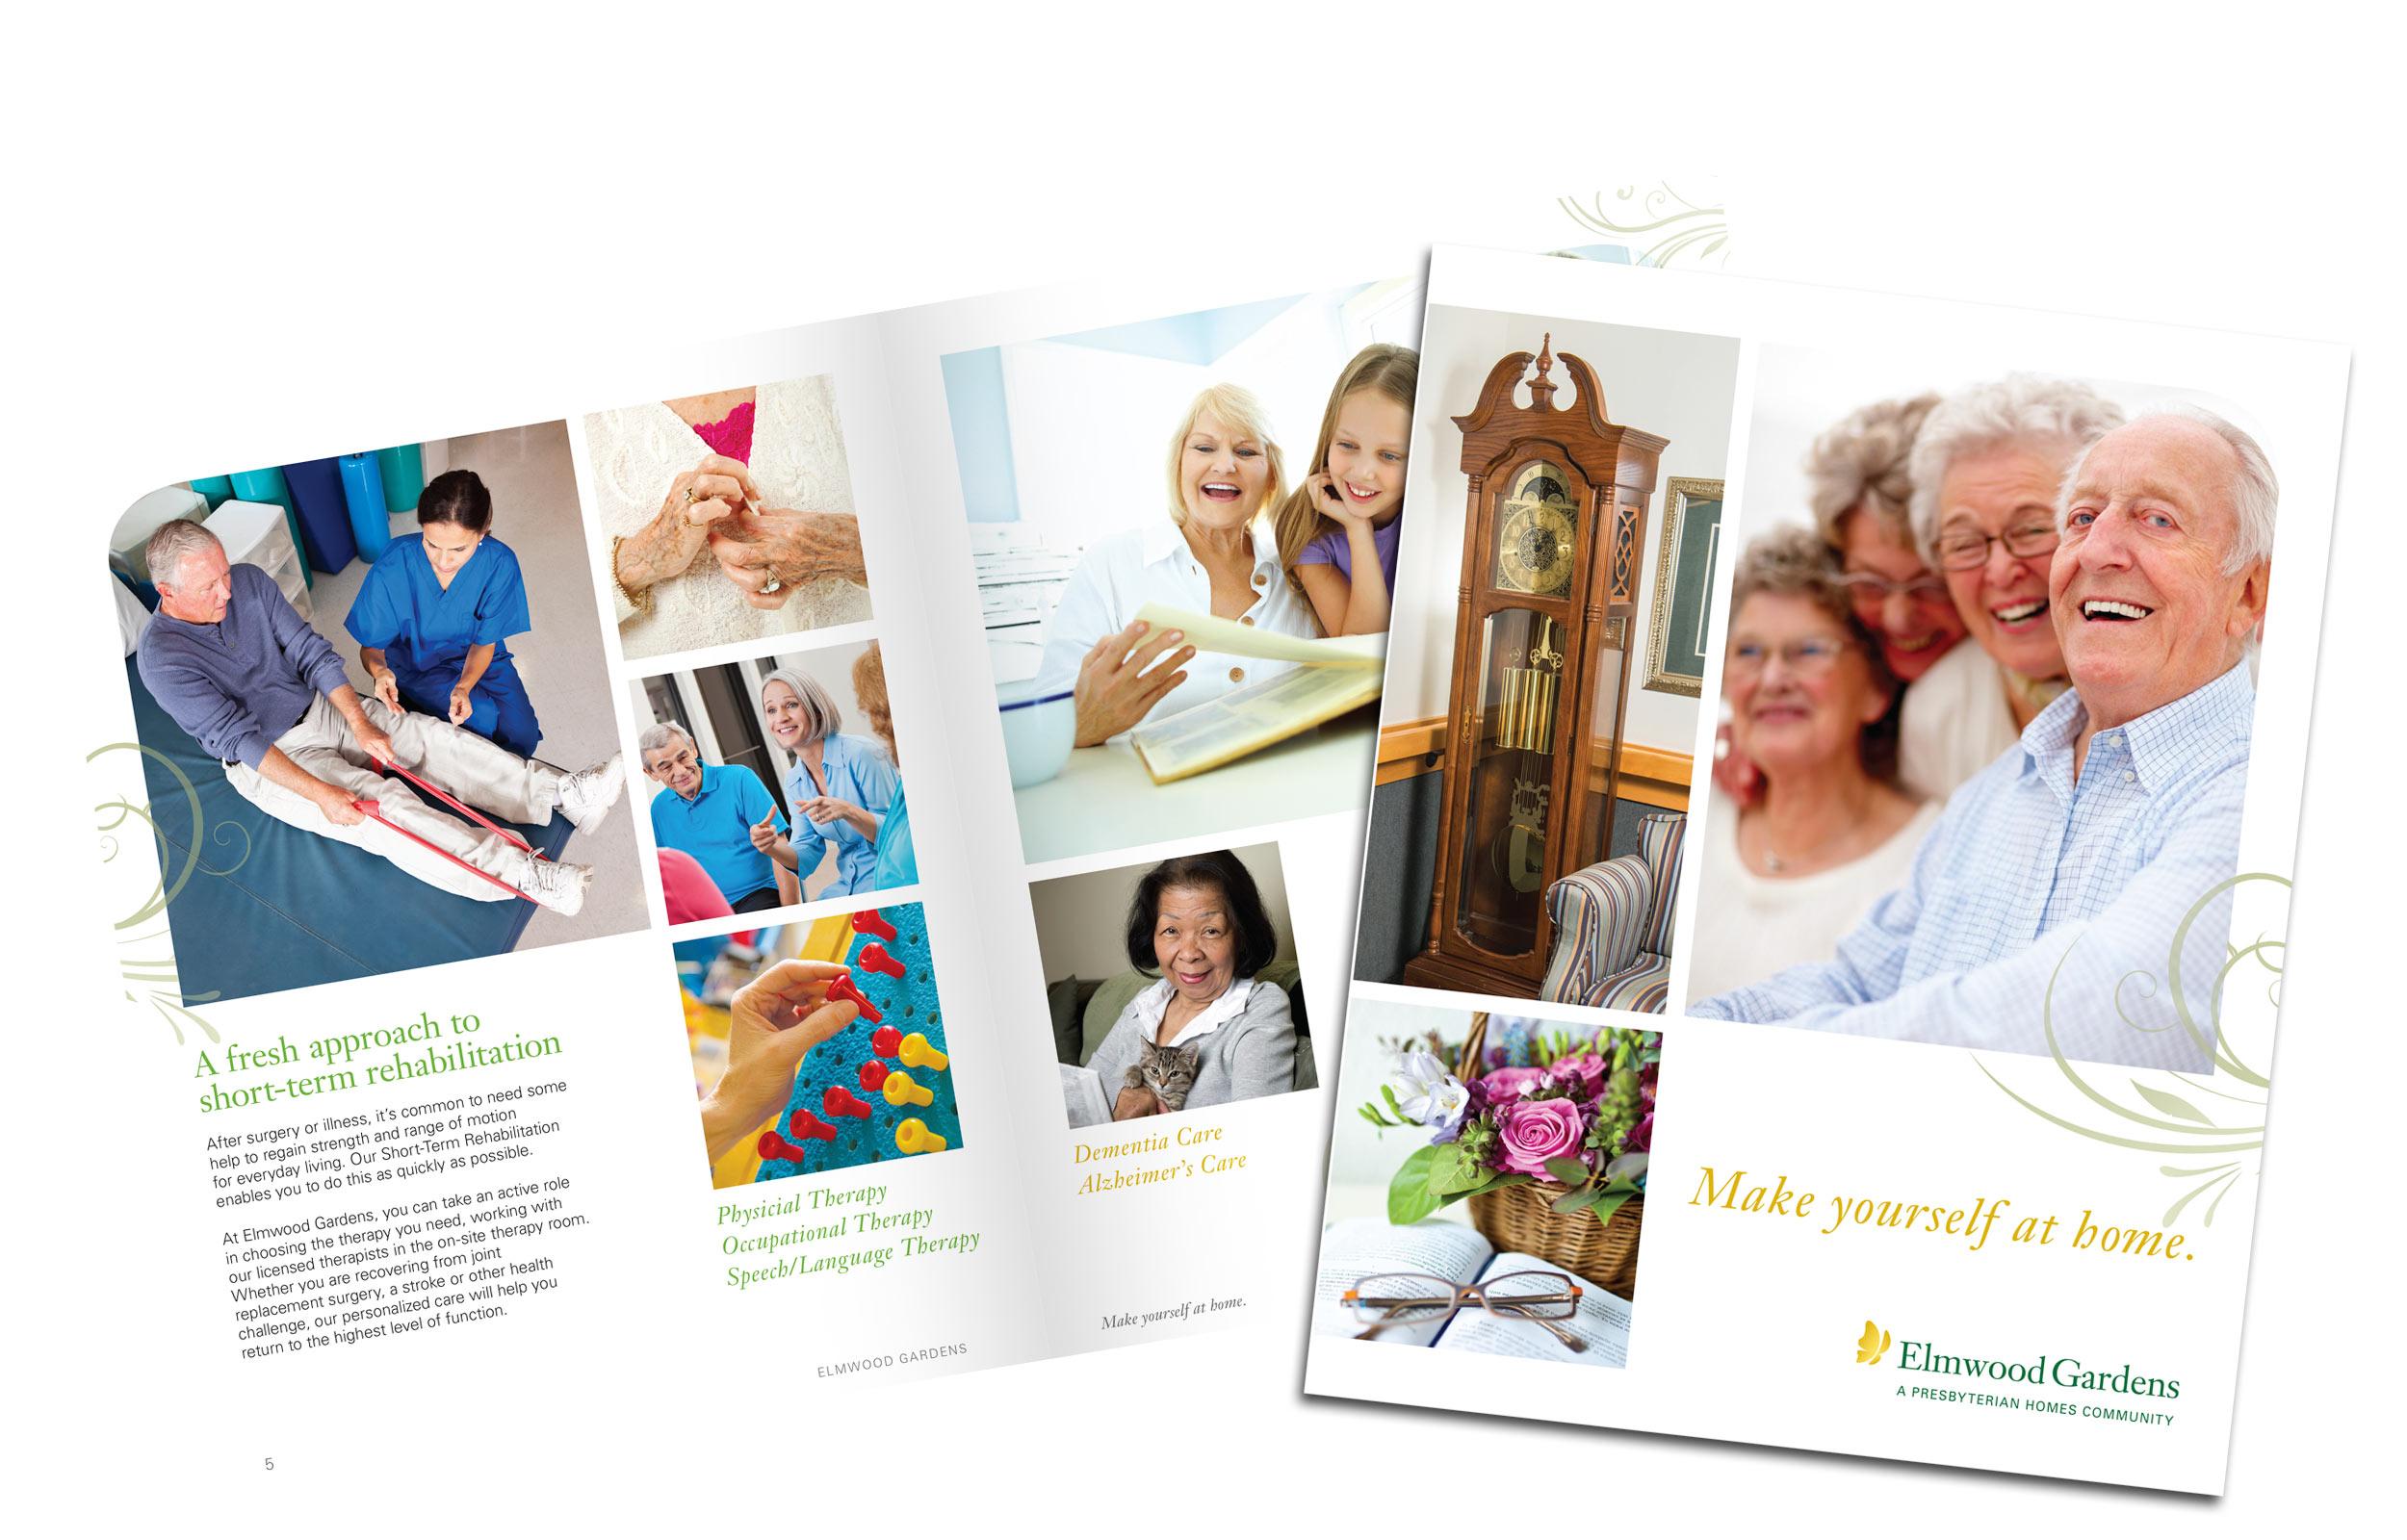 http://papaadvertising.com/wp-content/uploads/2015/04/capabilities_brochure.jpg